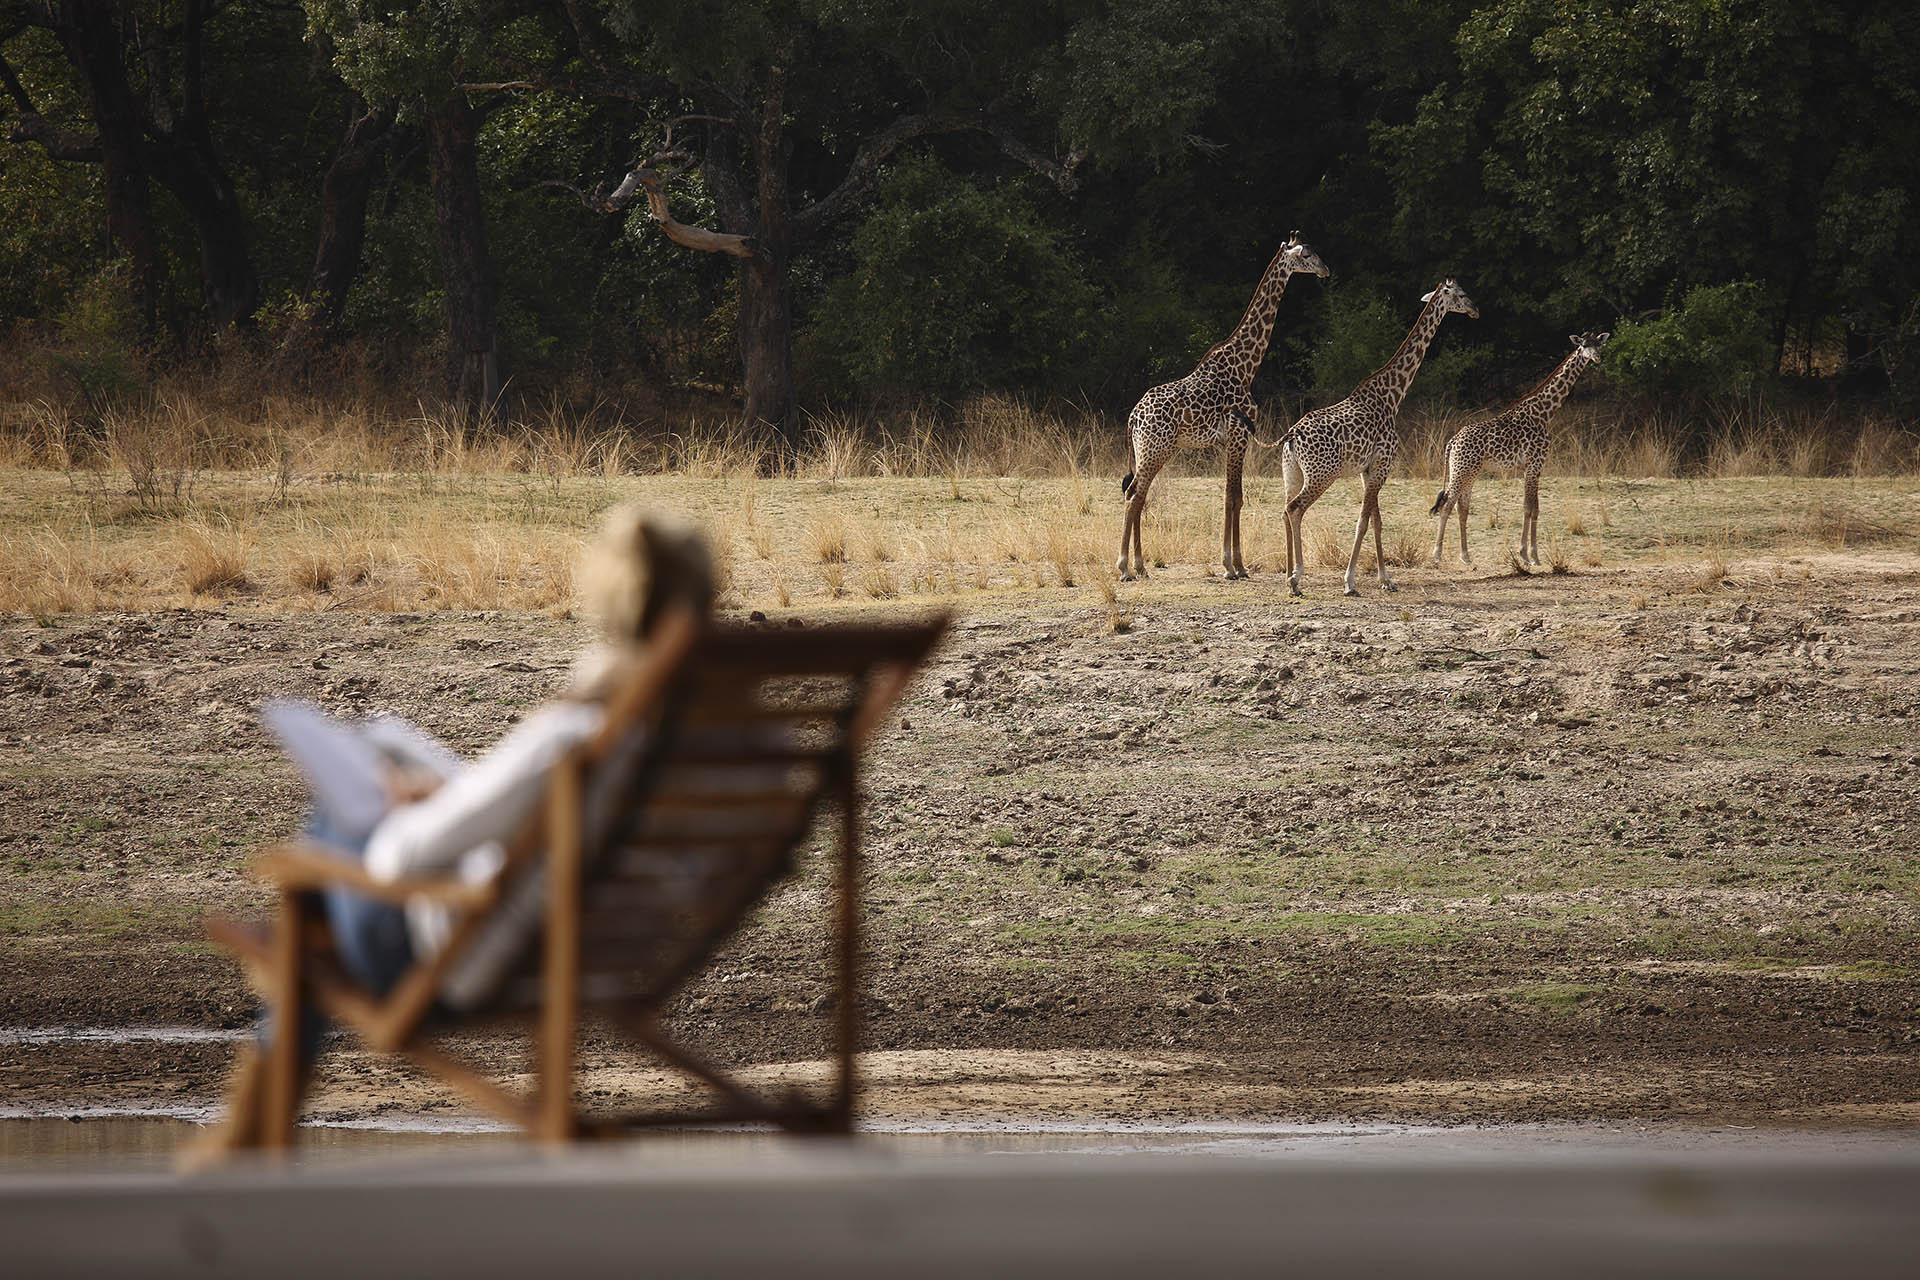 nkhotakota wildlife reserve malawi-national-parks-reserves-malawian-style-malawi-adventures-experiences-specialist-tour-operator-chinzombo-giraffe